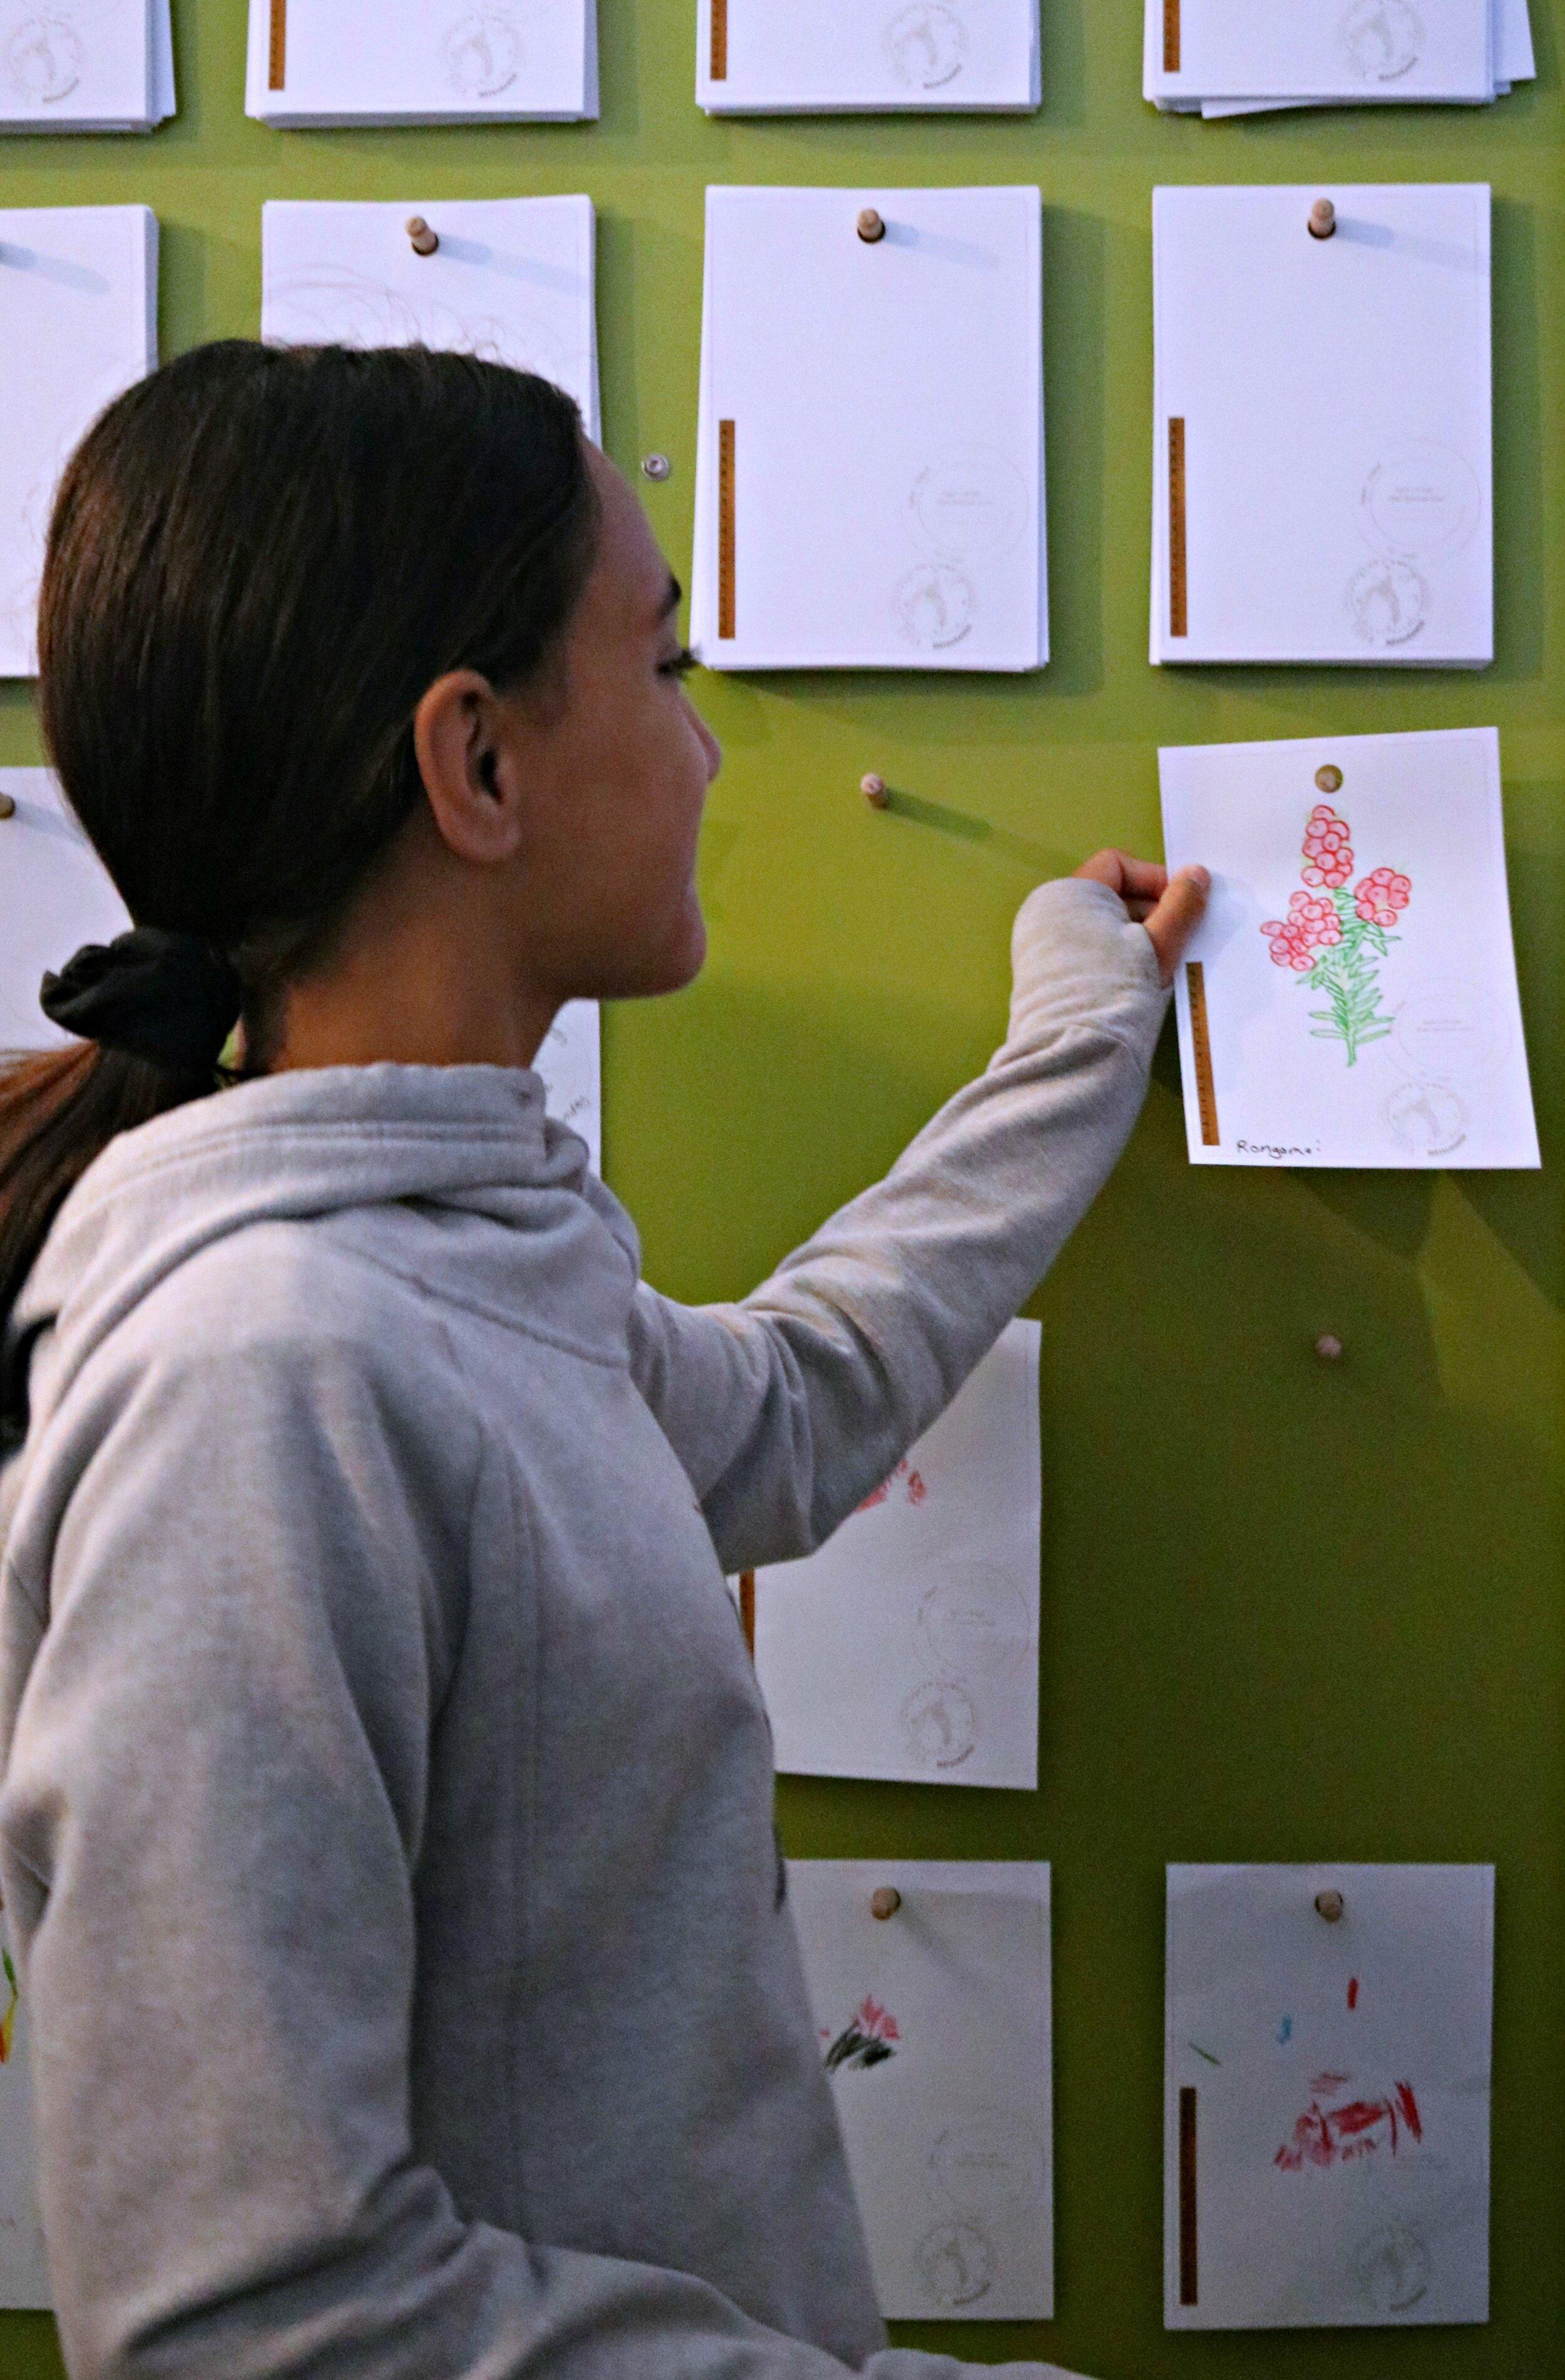 Tamariki were invited to share their artwork on the plant display wall in Tūranga-nui-a-Kiwa - Gisborne